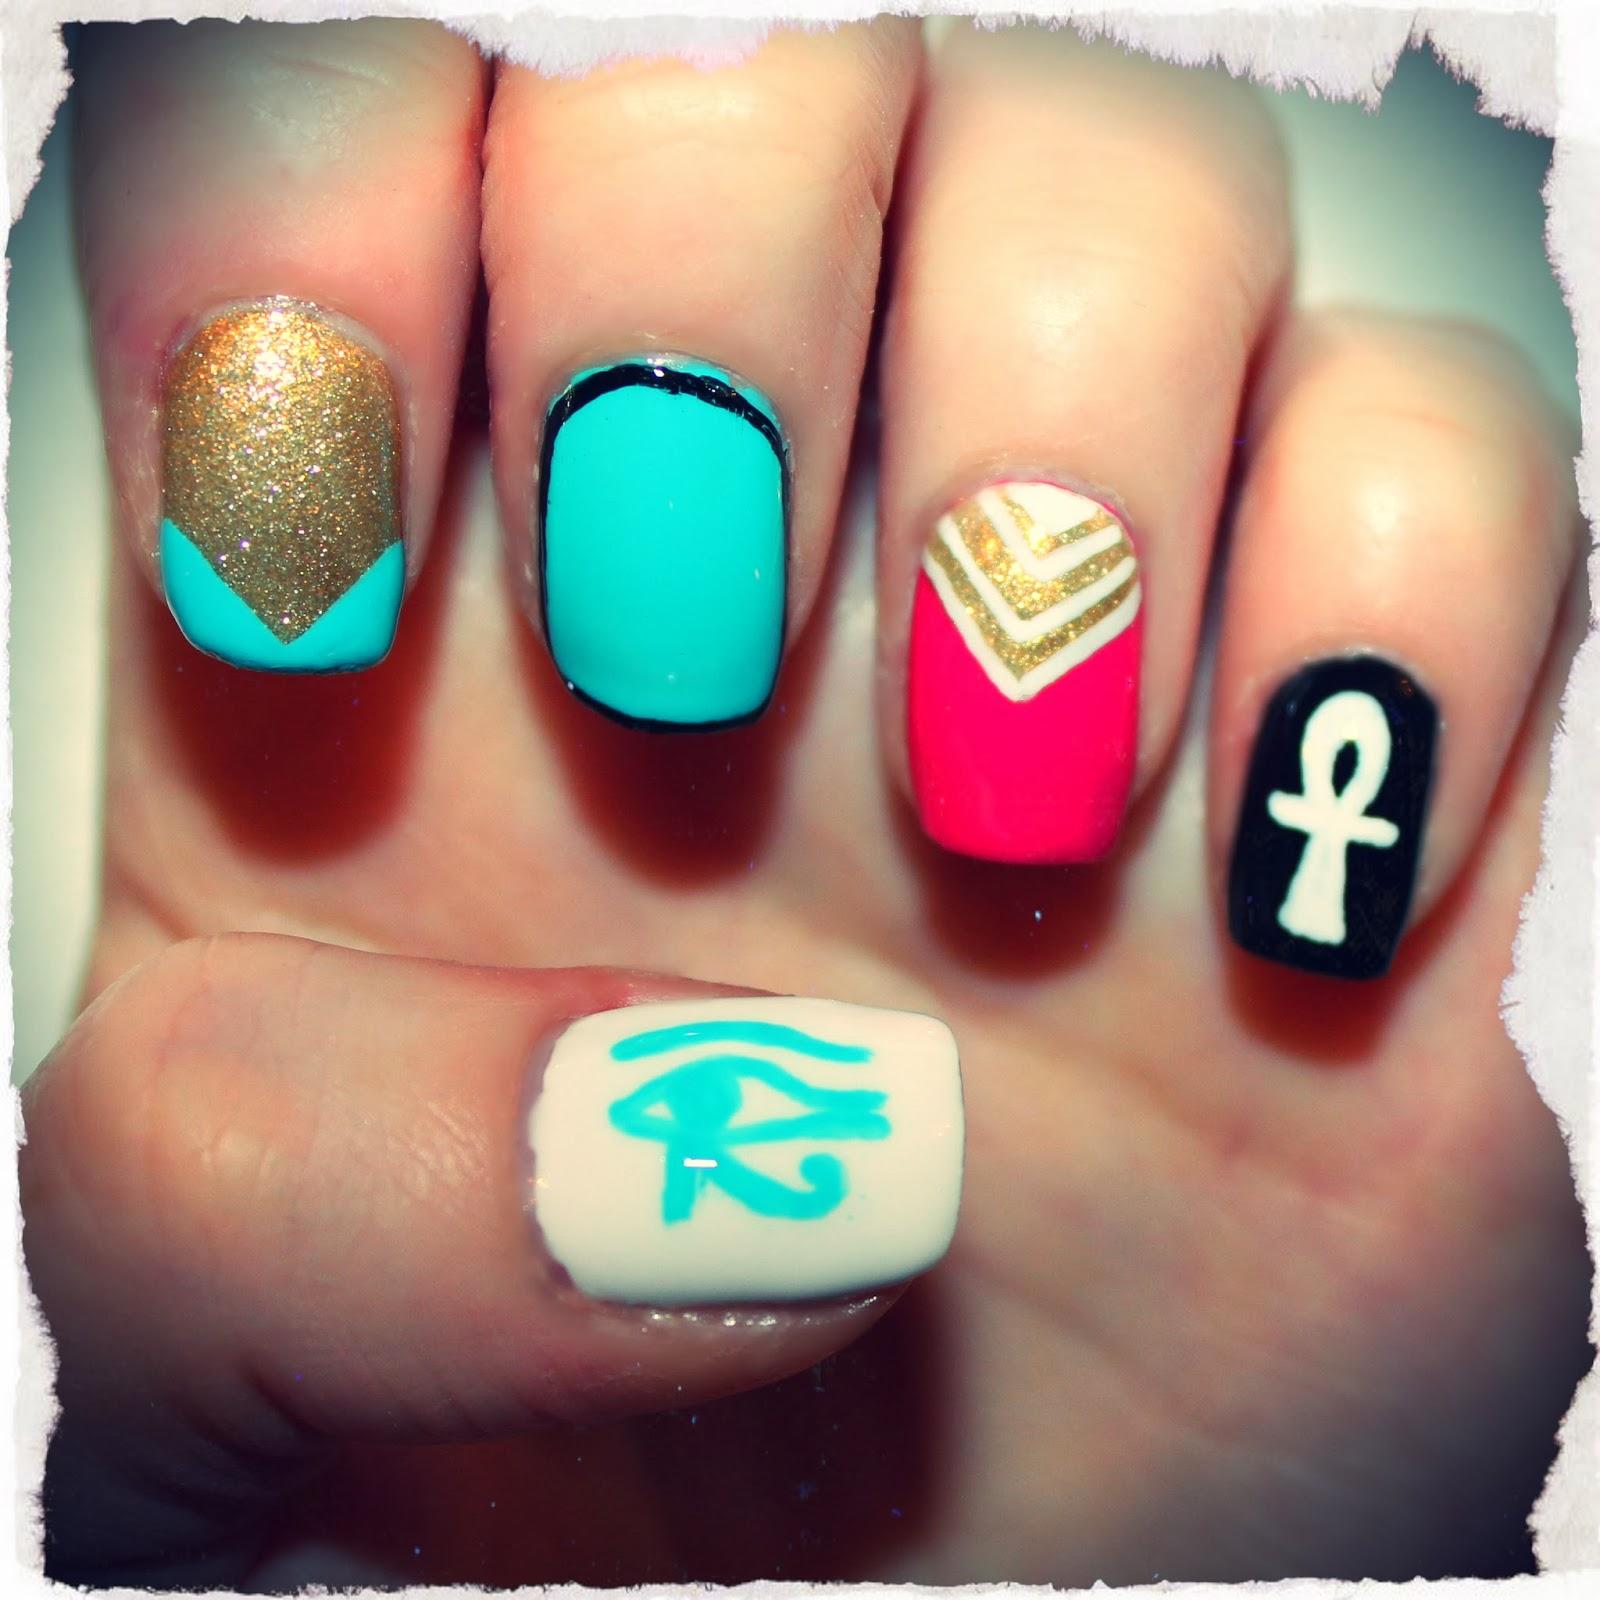 Dahlia Nails: March 2014